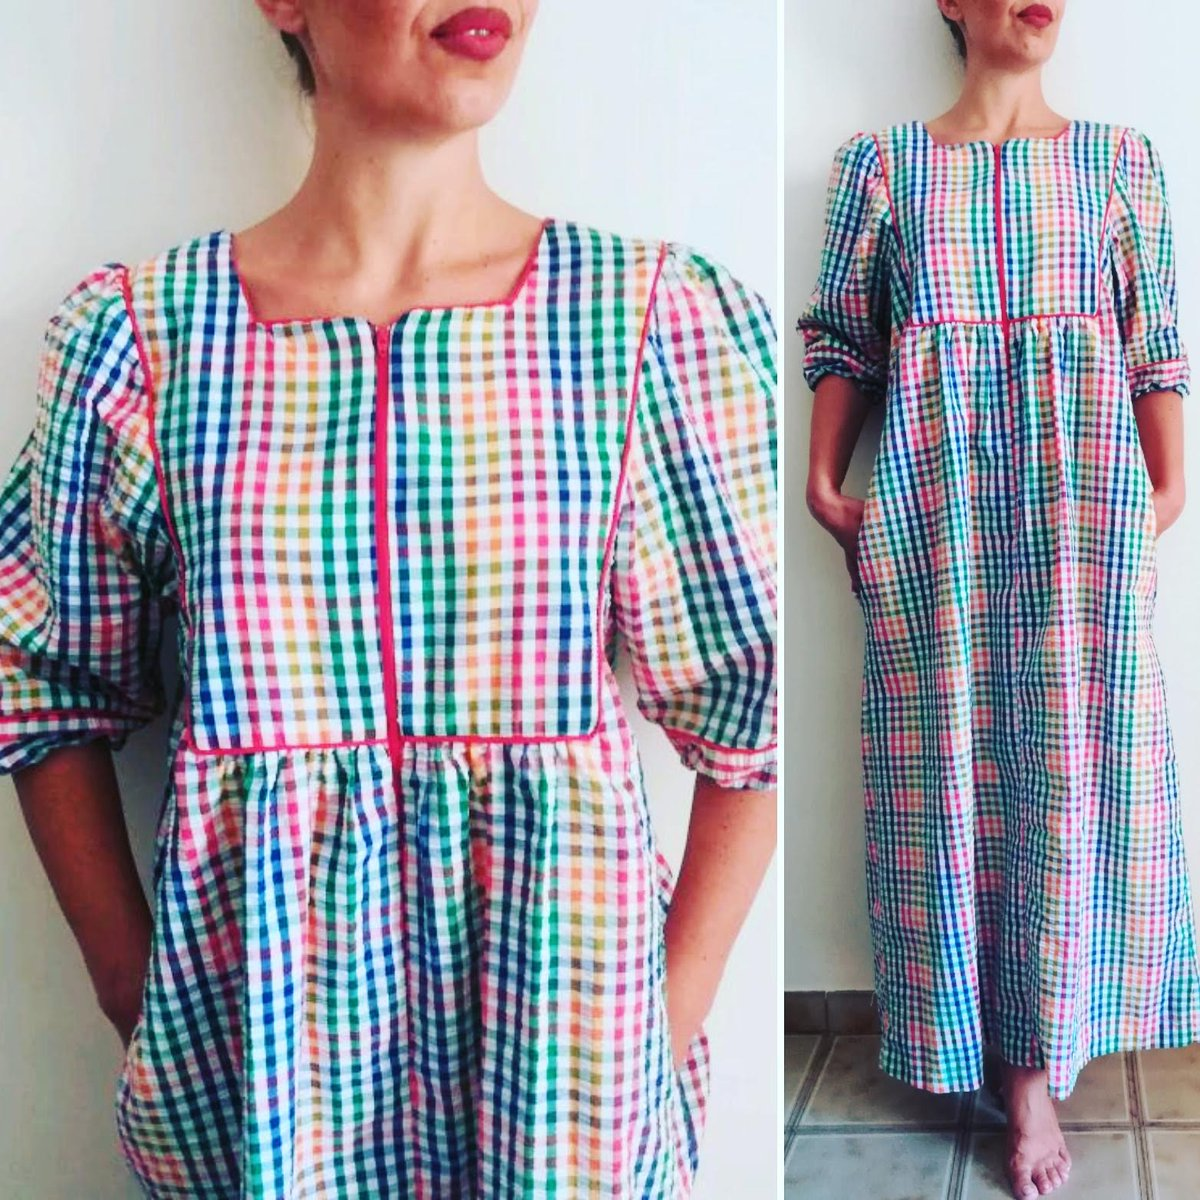 41d360a12b9 80s Saybury Maxi Dress http   presquenew.etsy.com  presquenew  vintage   saybury  maxidress  checked  checkeddress  womandress  dress  dresses   colorful ...